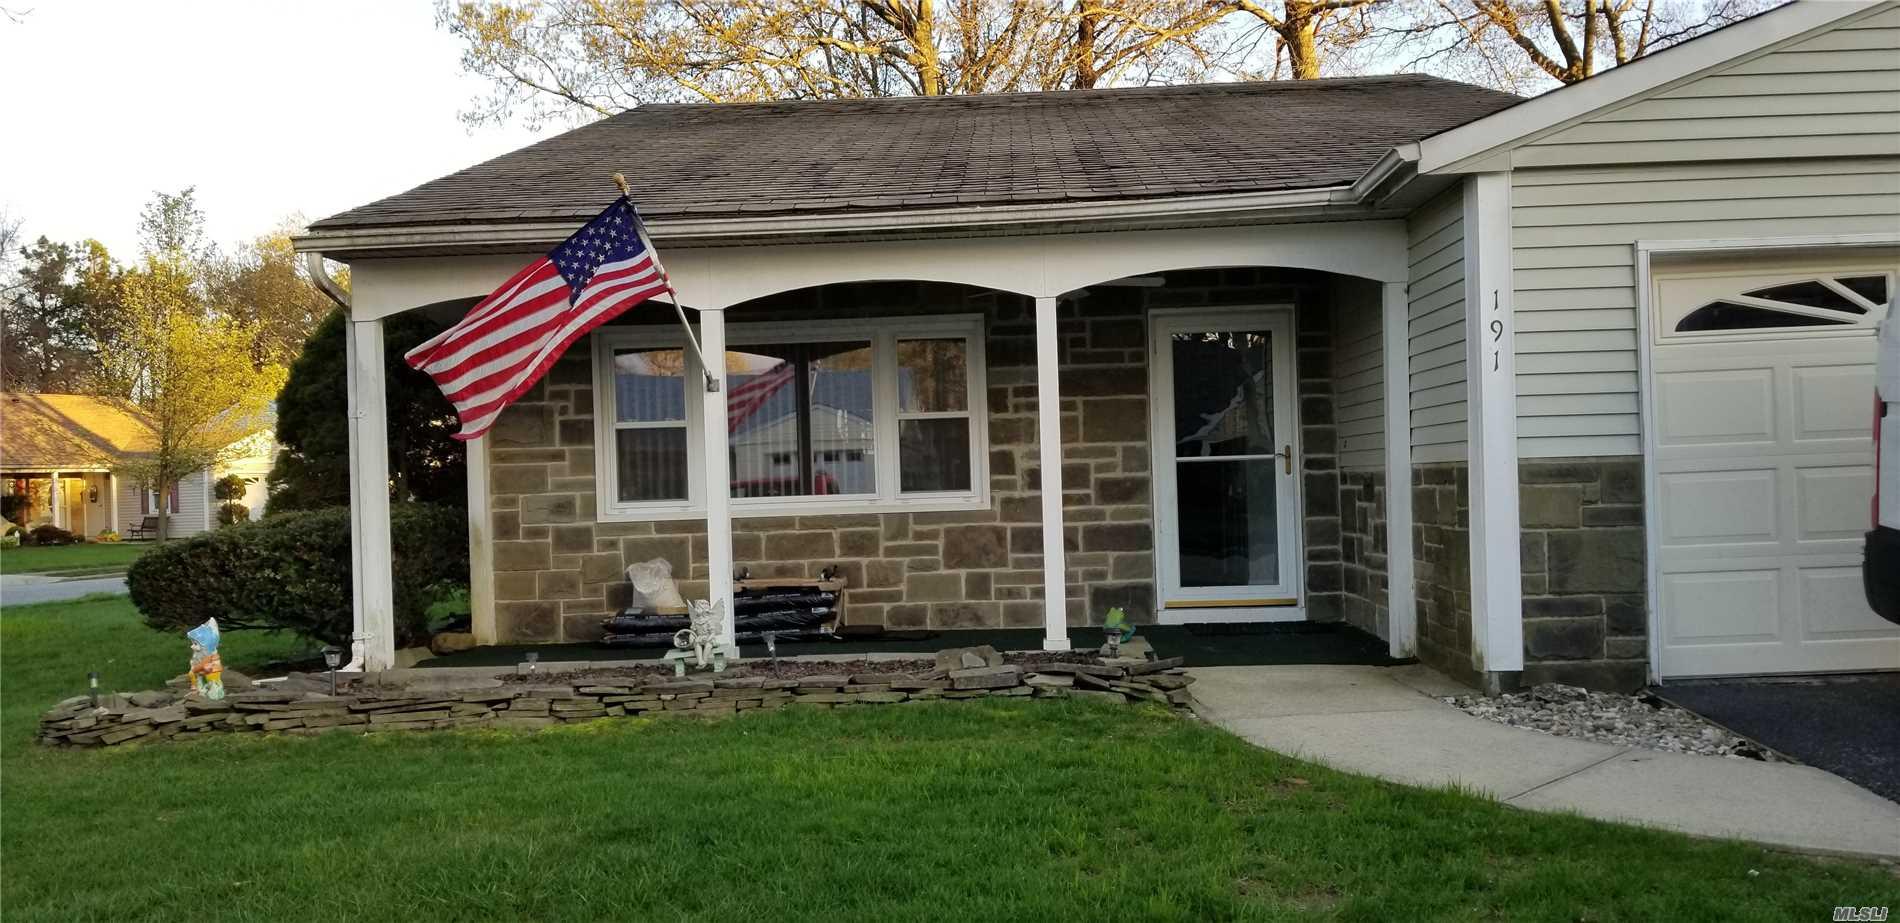 Property for sale at 191 Edinburgh Drive, Ridge NY 11961, Ridge,  New York 11961